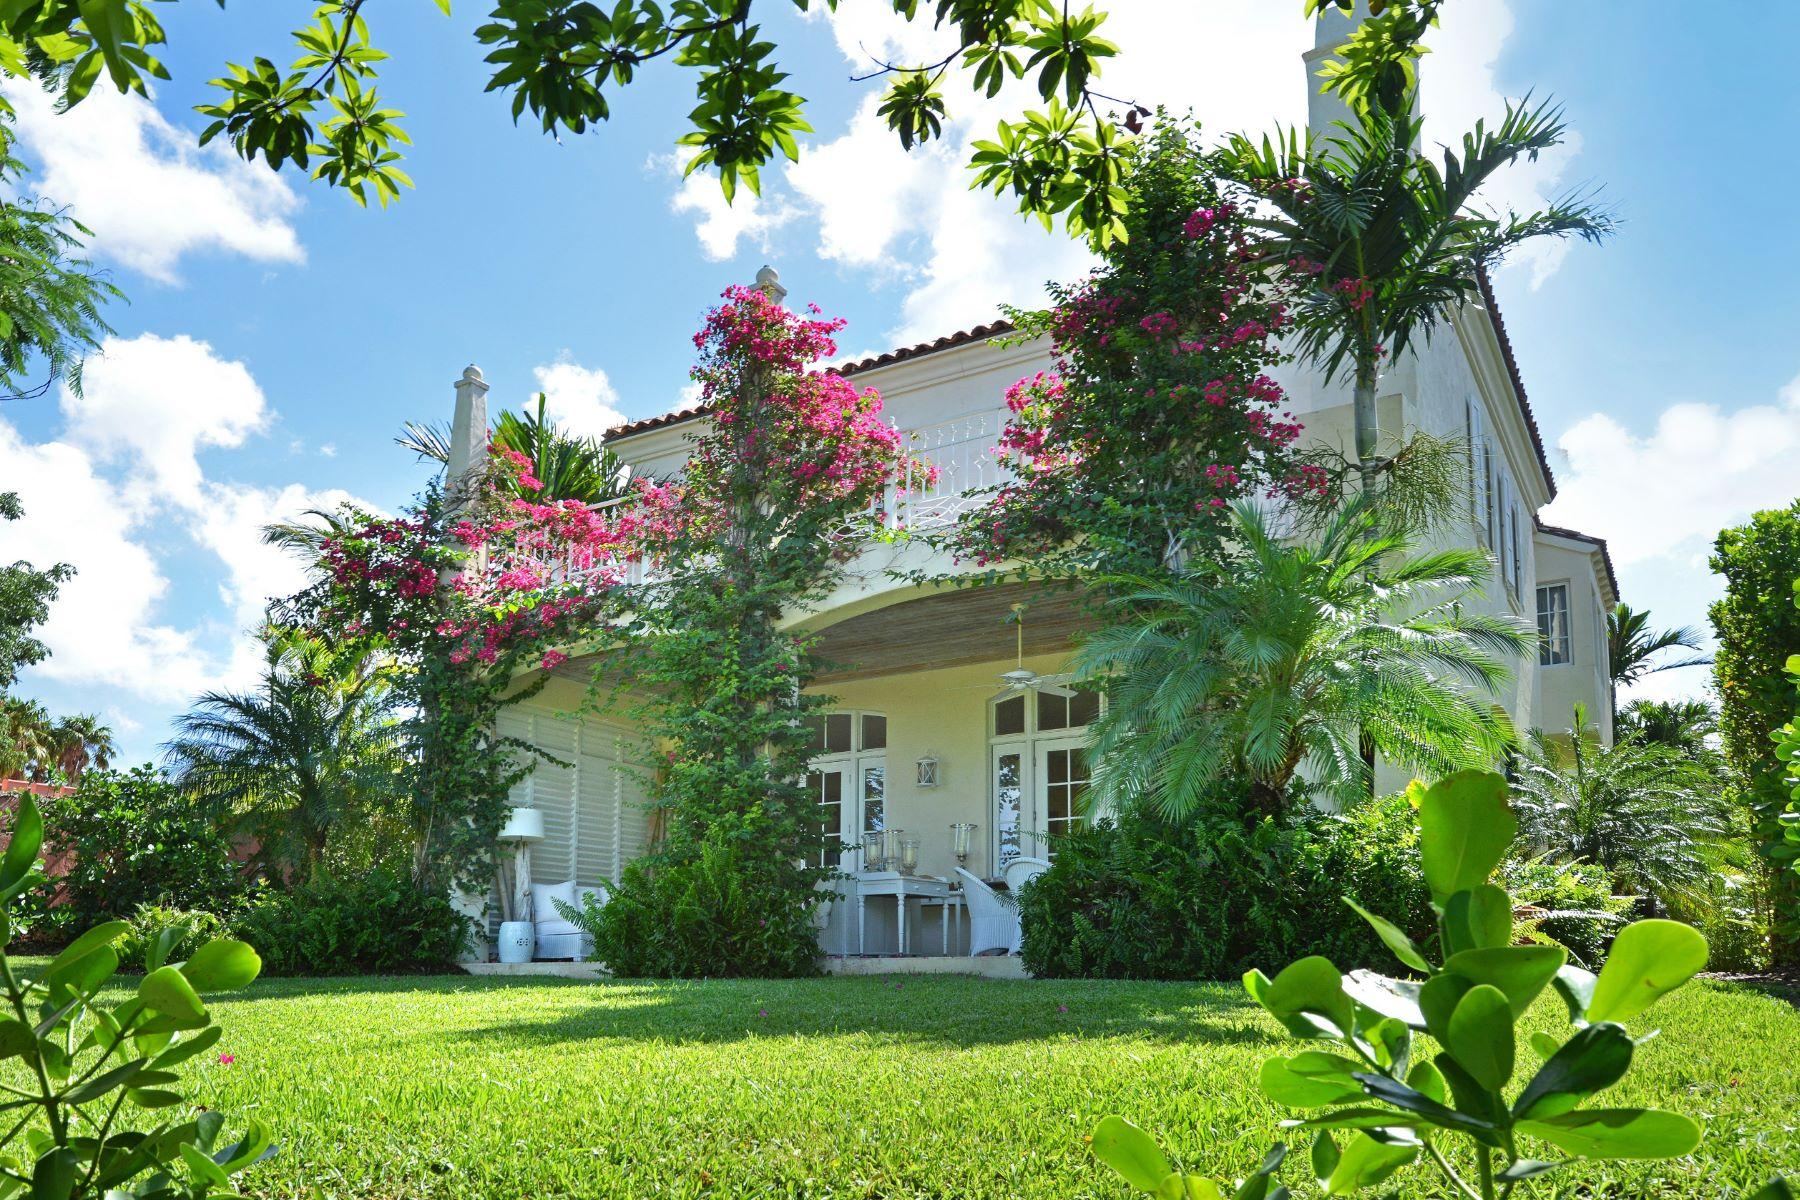 Maison unifamiliale pour l Vente à Dilly House, #5 Ridgetop Old Fort Bay, New Providence/Nassau Bahamas